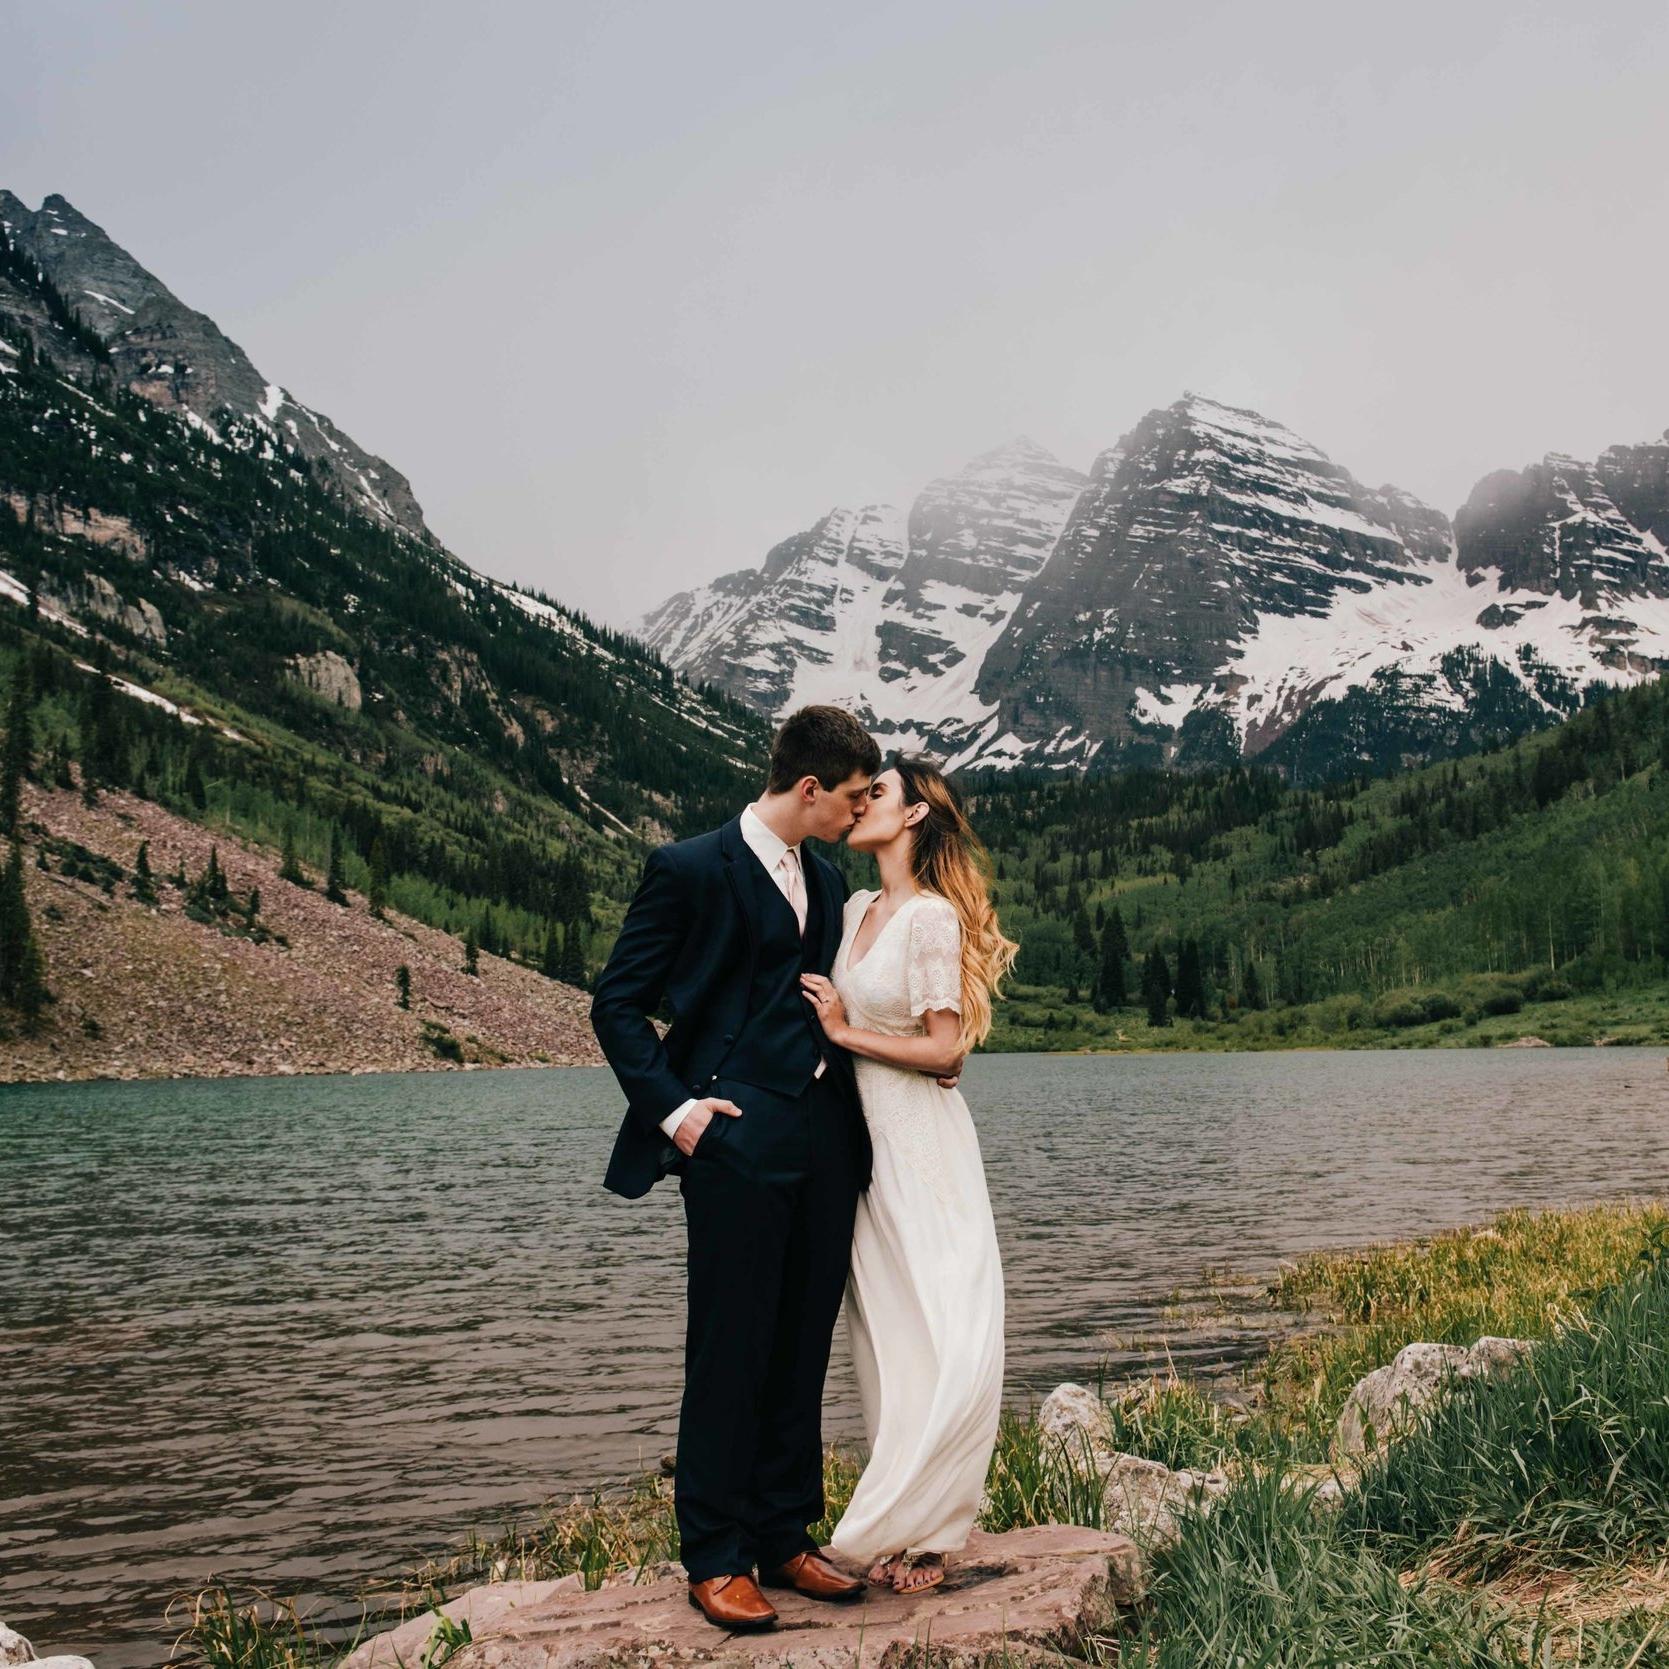 Adventurous-Wedding-Photography-Adventurous-Wedding-Photograph-Adventure-Elopement-Photographer-Adventurous-Elopement-Photograph-Adventurous-Elopement-Photographer-Adventurous-Destination-Elopement-Photographer-Destination-Elopement-Photography-Destination-Elopement-Packages-Rocky-Mountain-Elopement-Rocky-Mountain-National-Park-Photographer-Colorado-Elopement-Colorado-Elopement-Photographer-Colorado-Elopement-Photography-Iceland-Elopement-Photographer-Iceland-Elopement-Packages-Hiking-Wedding-Hiking-Elopement-Photographer-Mountain-Wedding-Photographer-Mountain-Wedding-Photography-Colorado-Mountain-Wedding-Colorado-Mountain-Elopement-Adventure-wedding-adventure-elopement-Teresa-Woodhull-photography-Aspen-Elopement-Packages-Lets-Elope-To-Aspen-Maroon-Bells-Wedding-Maroon-Bells-Elopement-Maroon-Bells-Destination-Elopement-Maroon-Bells-Destination-Wedding-Maroon-Bells-Elopement-Photographer-Maroon-Bells-Wedding-Photographer-Aspen-Wedding-Photographer-Aspen-Wedding-Photography-Aspen-Destination-Wedding-Photographer-Aspen-Elopement-Photography-Snowmass-Wedding-Photographer-Snowmass-Elopement-Snowmass-Destination-wedding-Teresa-Woodhull-photographer-Intimate-wedding-photographer-Intimate-wedding-photography-elopement-photographer-traveling-wedding-photographer-traveling-elopement-photographer-Adventure-elopement-photographer-Adventure-wedding-photographer-Destination-wedding-Destination-elopement-Destination-wedding-photography-Destination-wedding-photographer-Teresa-Woodhull-Intimate-Wedding-Photography-Teresa-Woodhull-Intimate-Wedding-Photographer-Teresa-Woodhull-Elopement-Photography-Teresa-Woodhull-Elopement-Photographer-Elopement-Photography-Intimate-Elopement-Photographer-Intimate-Elopement-Photography-Elopement-Wedding-Weddings-Elope-Elopements-Intimate-Weddings-Adventure-Weddings-Adventure-Wedding-Photograph-Adventure-Wedding-Photograph-becca-bryan-elopement